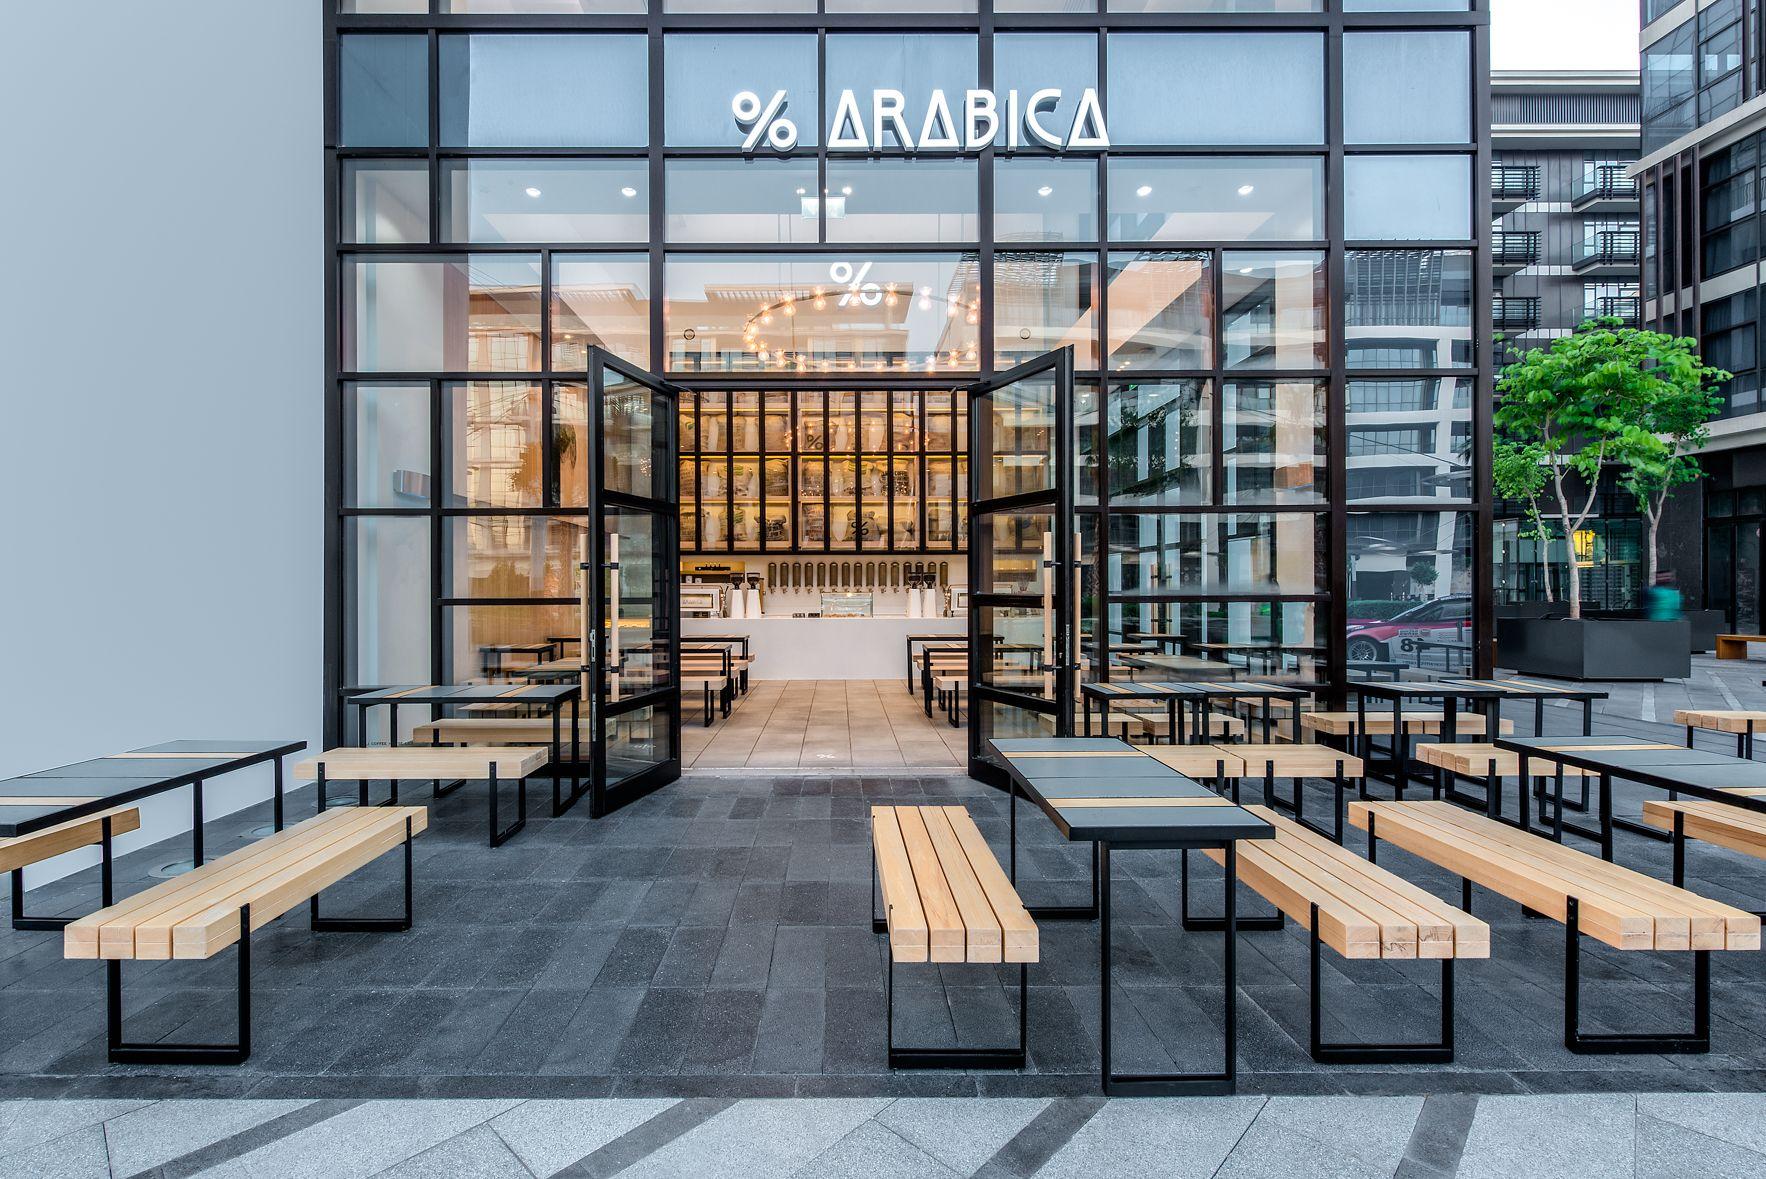 Arabica City Walk Dubai ショップデザイン 建築 店舗デザイン